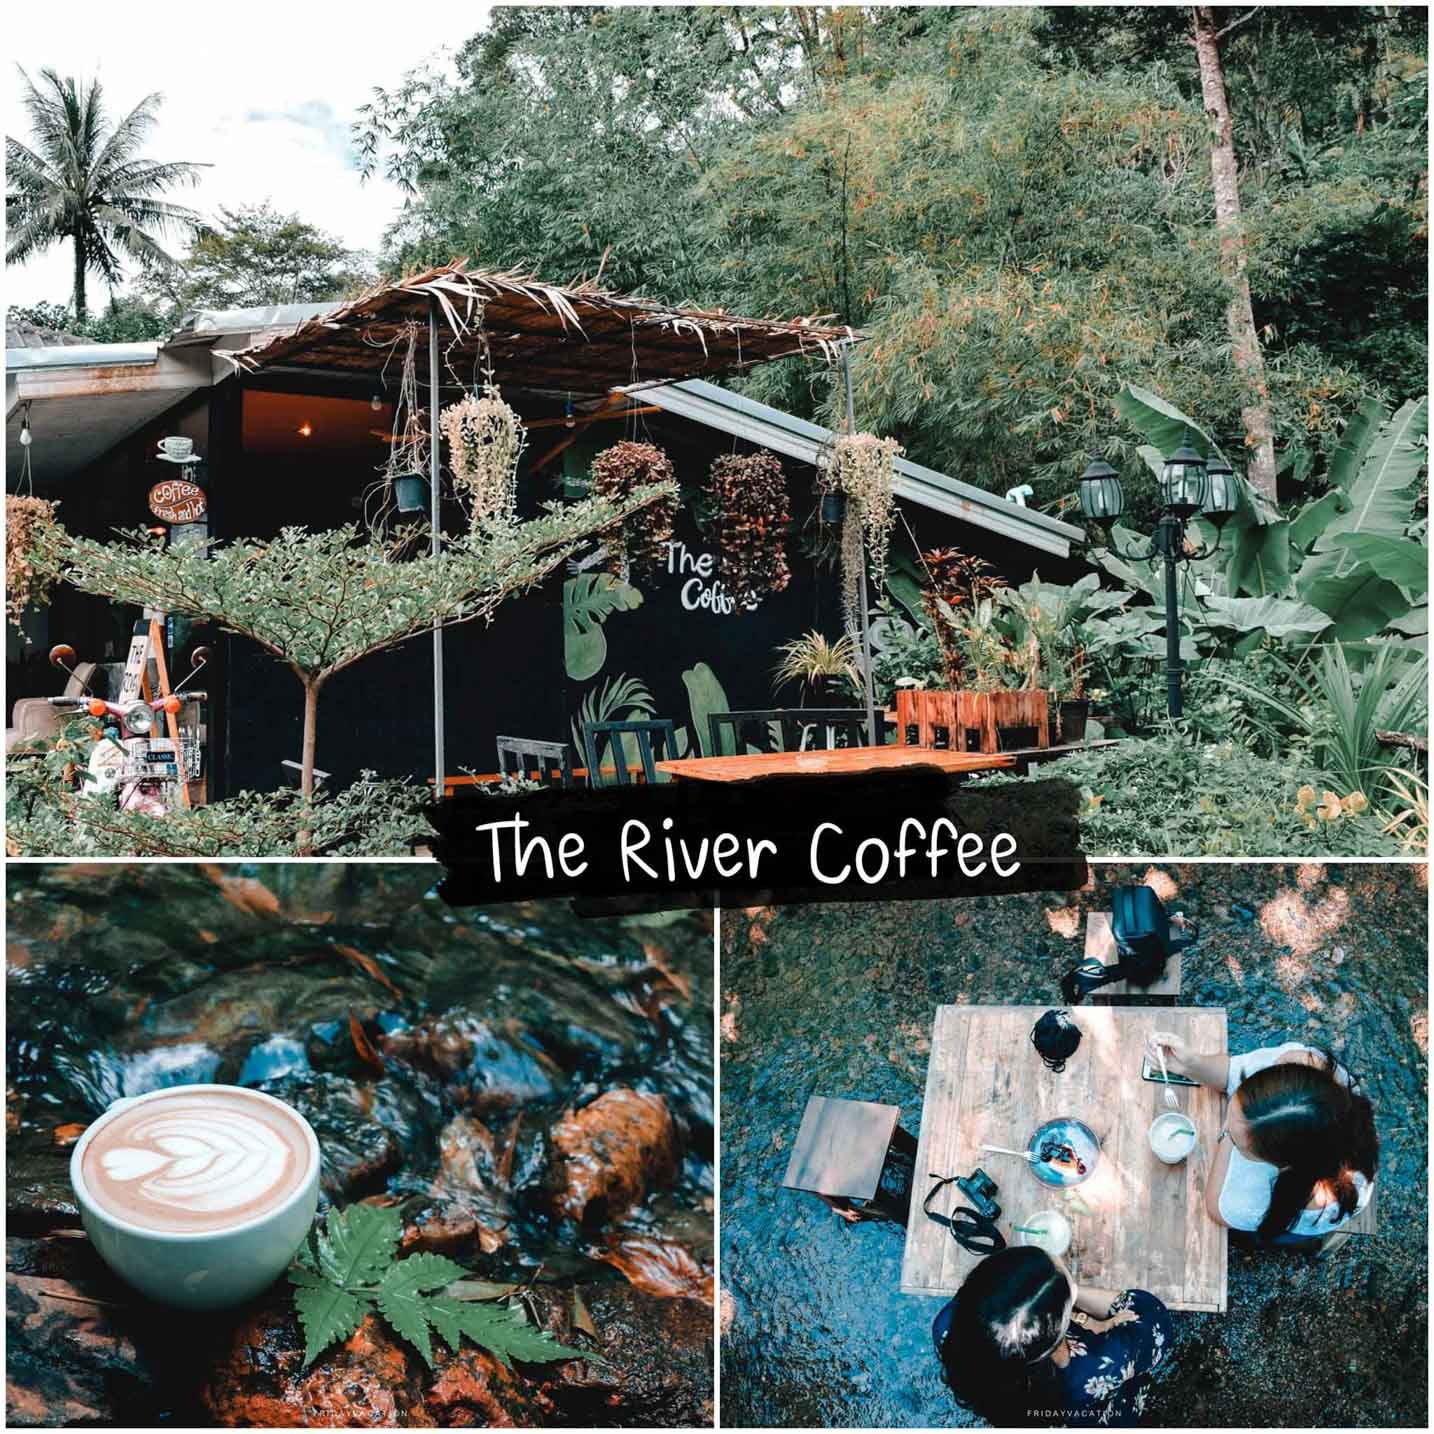 The river coffee บรรยากาศคือดีมากครับ ร้านกาแฟสวยๆริมลำธาร ซึ่งเป็นลำธารเล็กๆ น้ำไม่เยอะ  แต่น้ำในลำธารเย็นสบายมากๆ นั่งแช่น้ำจิบกาแฟ หรือกินเค้กแบบชิลๆได้สบายๆเลยครับ  แถมร้านข้างๆก็เป็นร้านอาหารอีสานรสชาติอร่อยด้วย สามารถสั่งมาทานด้วยกันได้ครับภูเก็ต,ที่พัก,โรงแรม,รีสอร์ท,สถานที่ท่องเที่ยว,ของกิน,จุดเช็คอิน,ที่เที่ยว,จุดถ่ายรูป